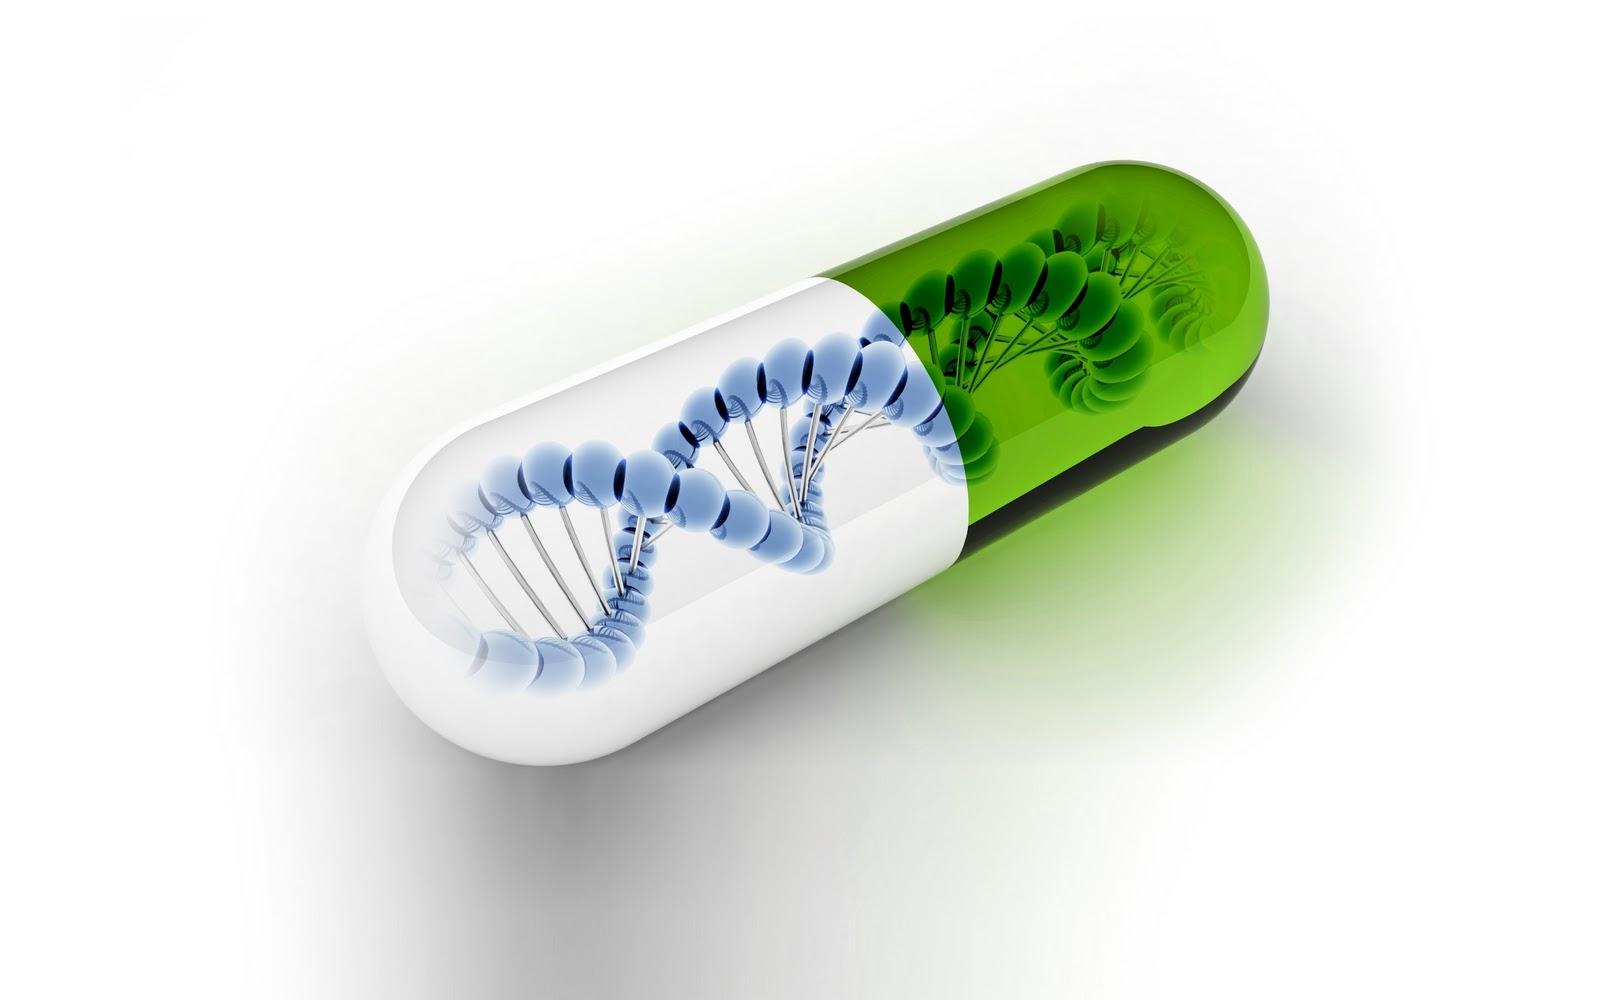 Biotech Bonanza: Breaking New Ground!